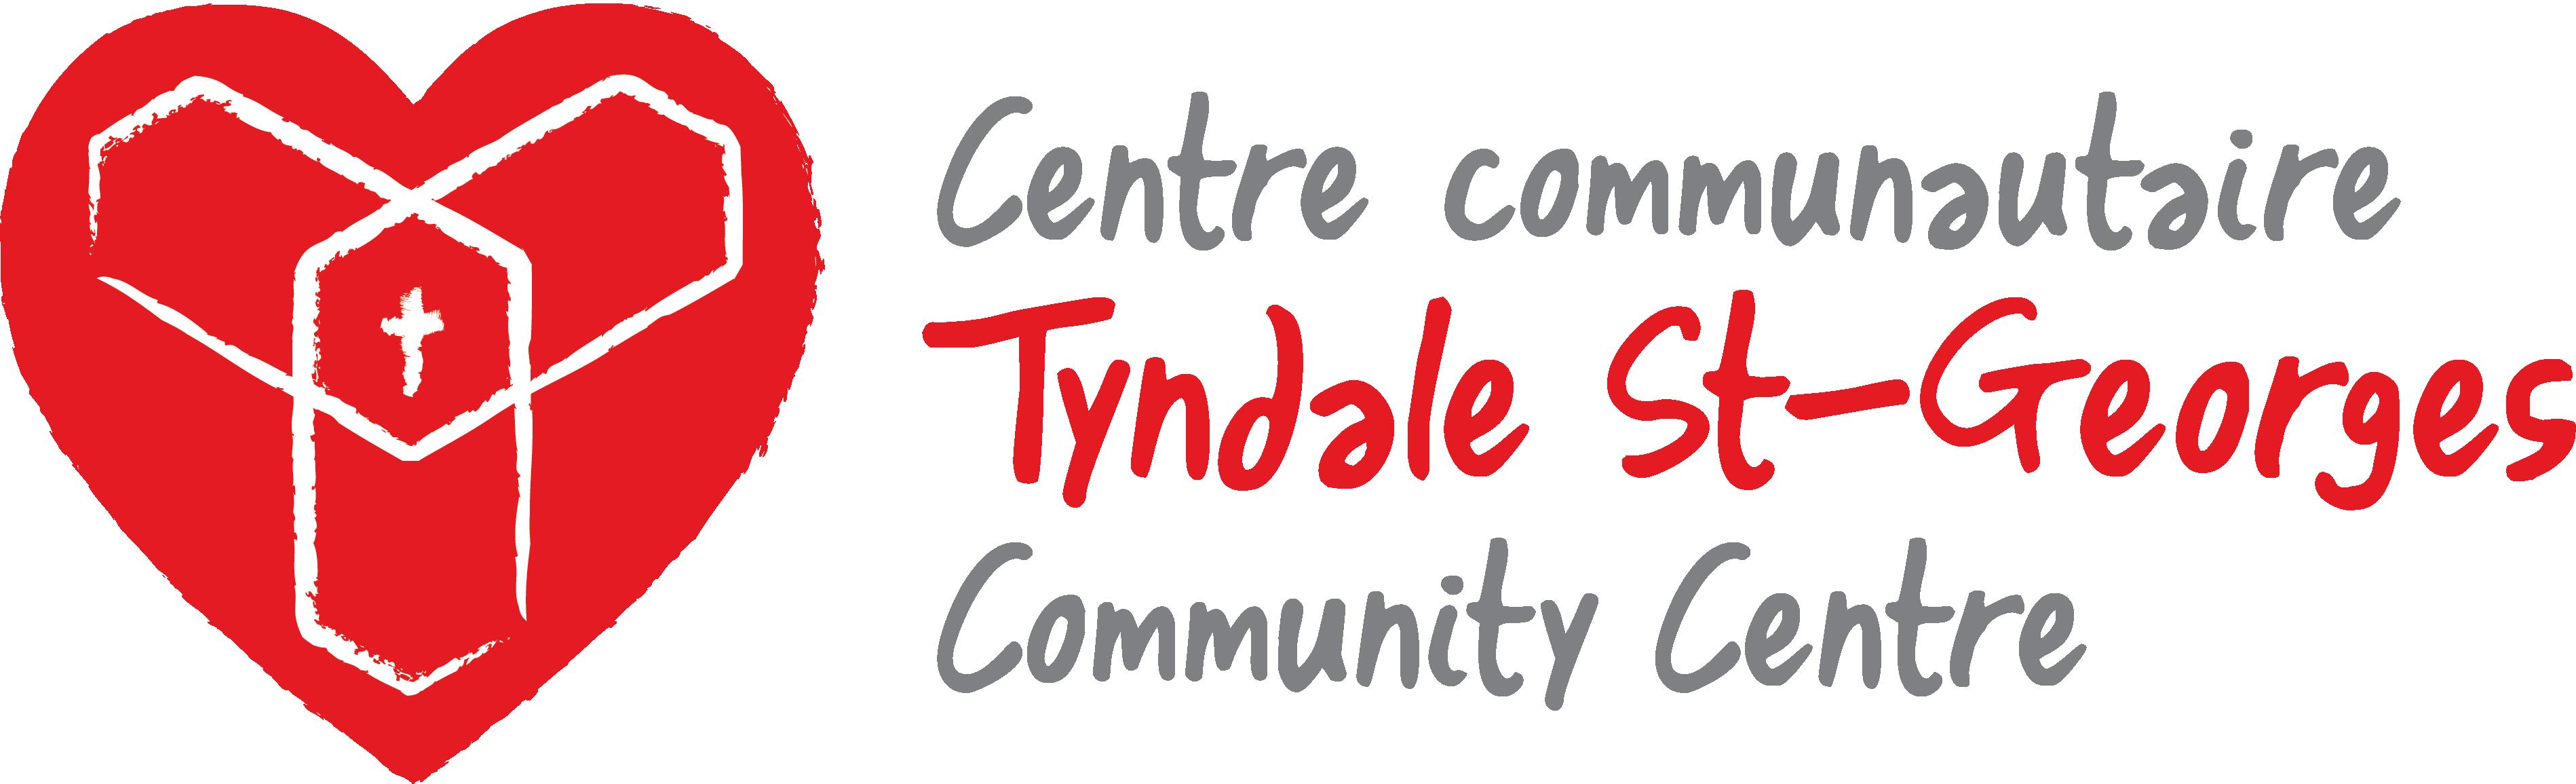 Tyndale St-Georges Community Centre